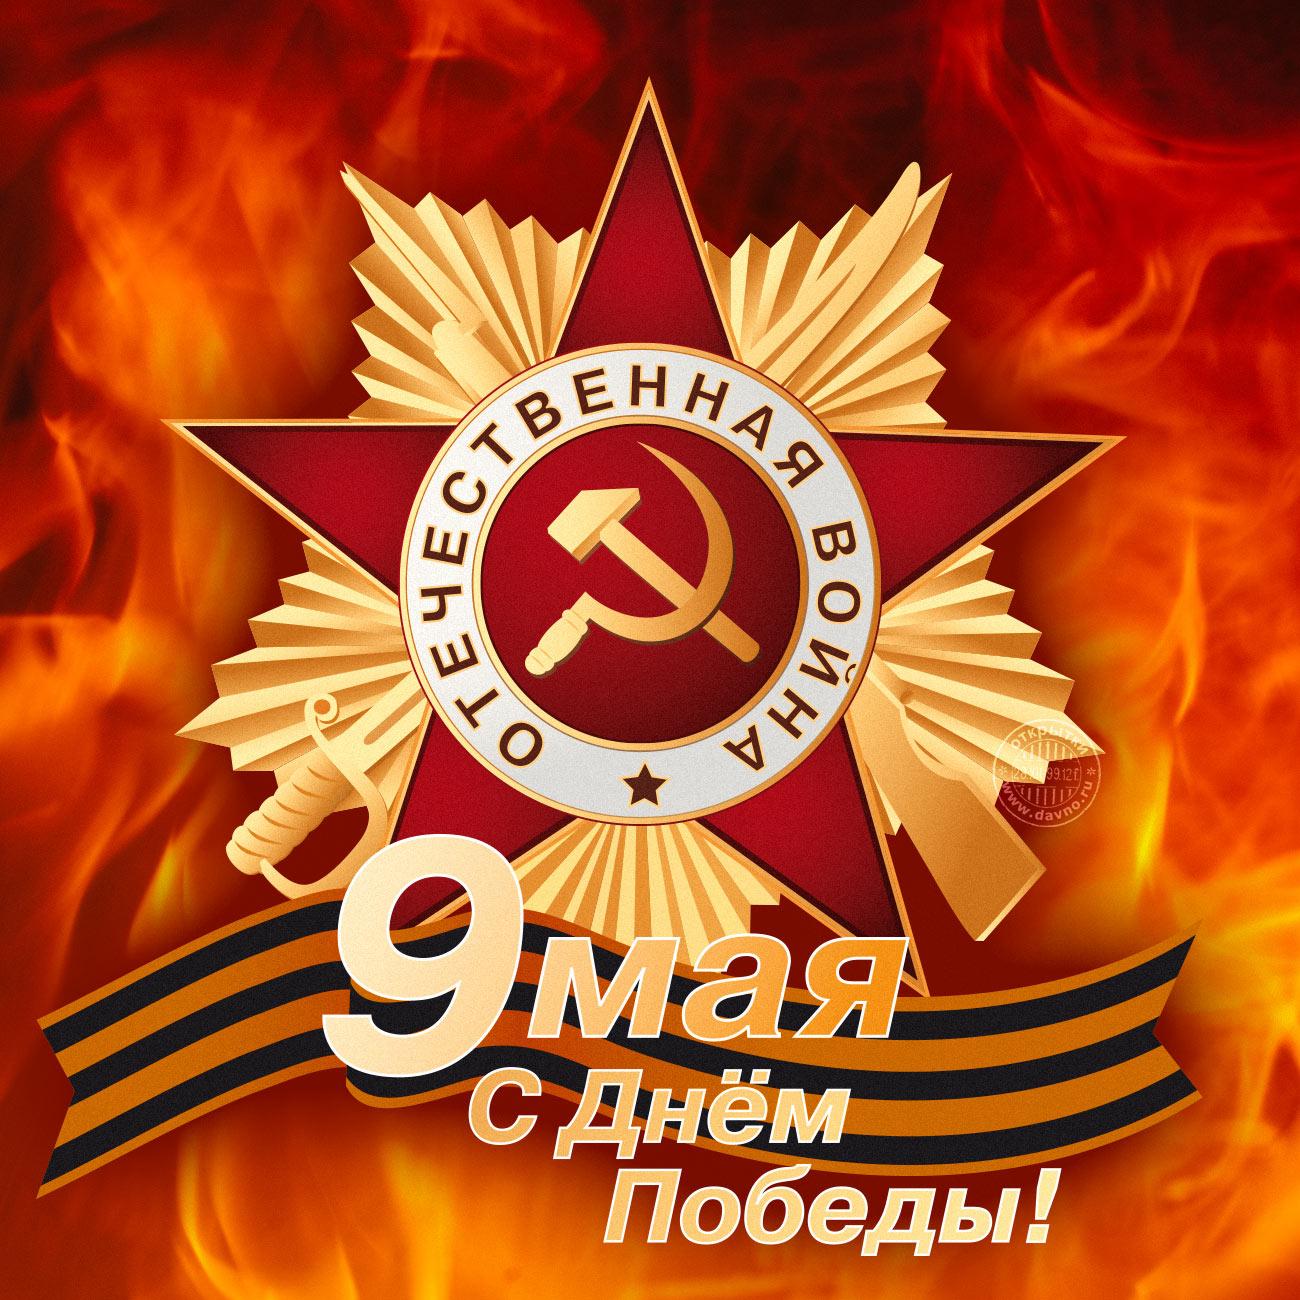 http://images.vfl.ru/ii/1525789817/df5b5ba1/21664128.jpg